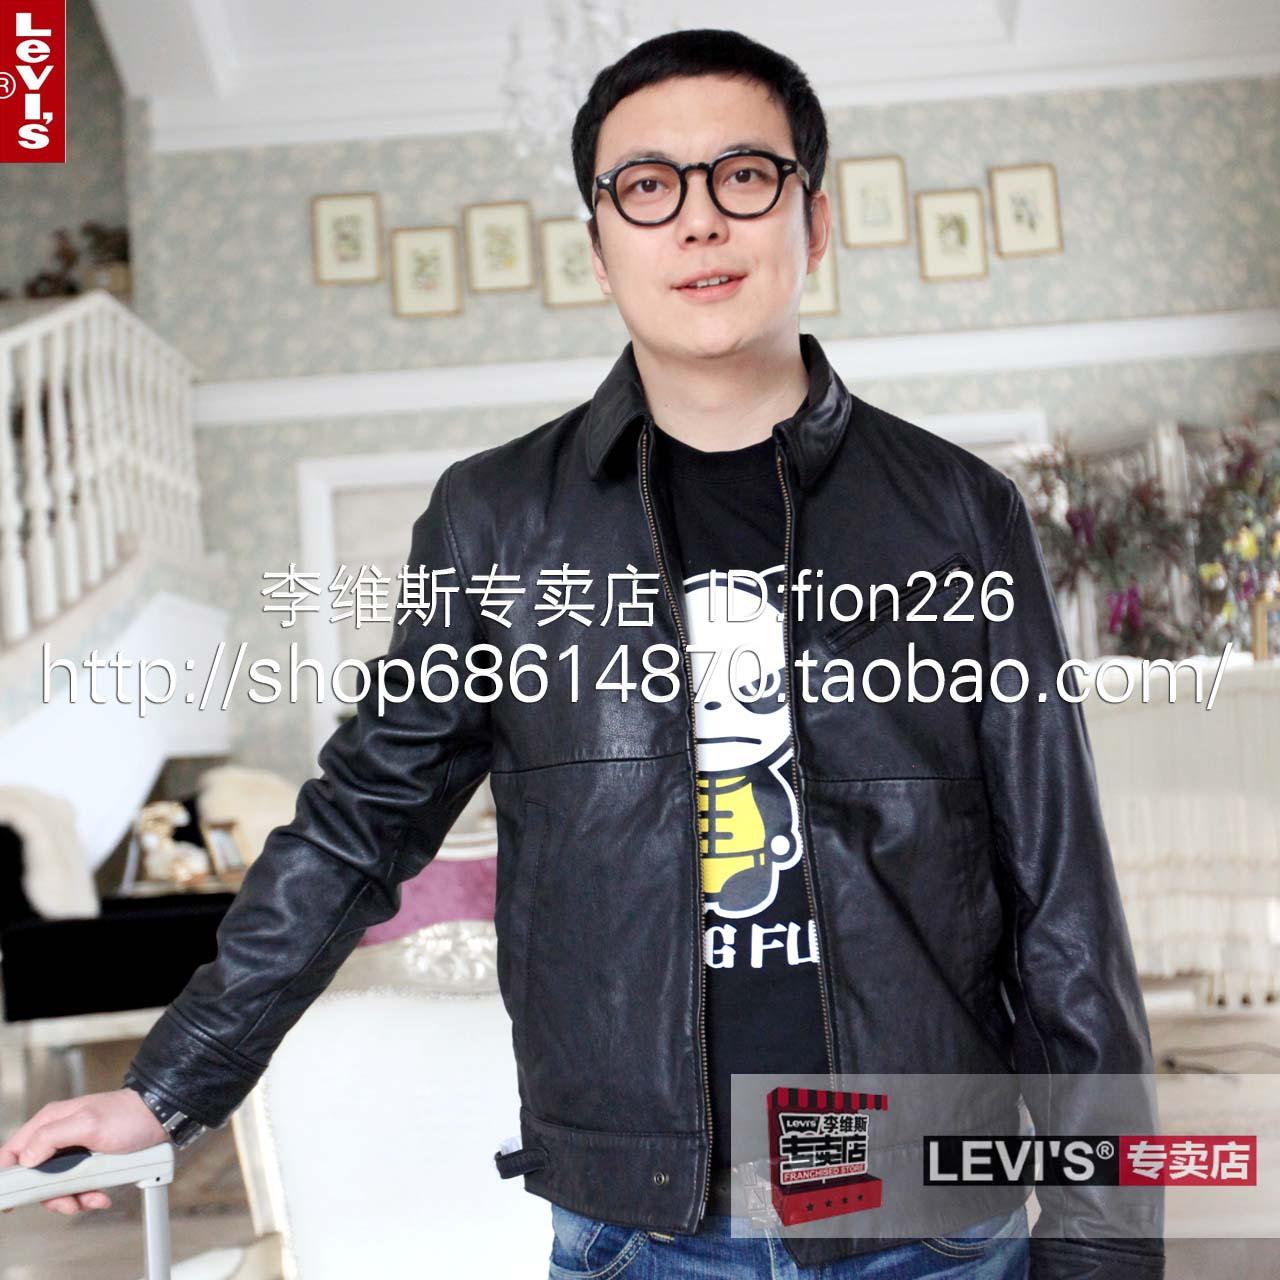 levis李维斯专柜正品男款羊皮革服皮衣皮夹克70684-0001